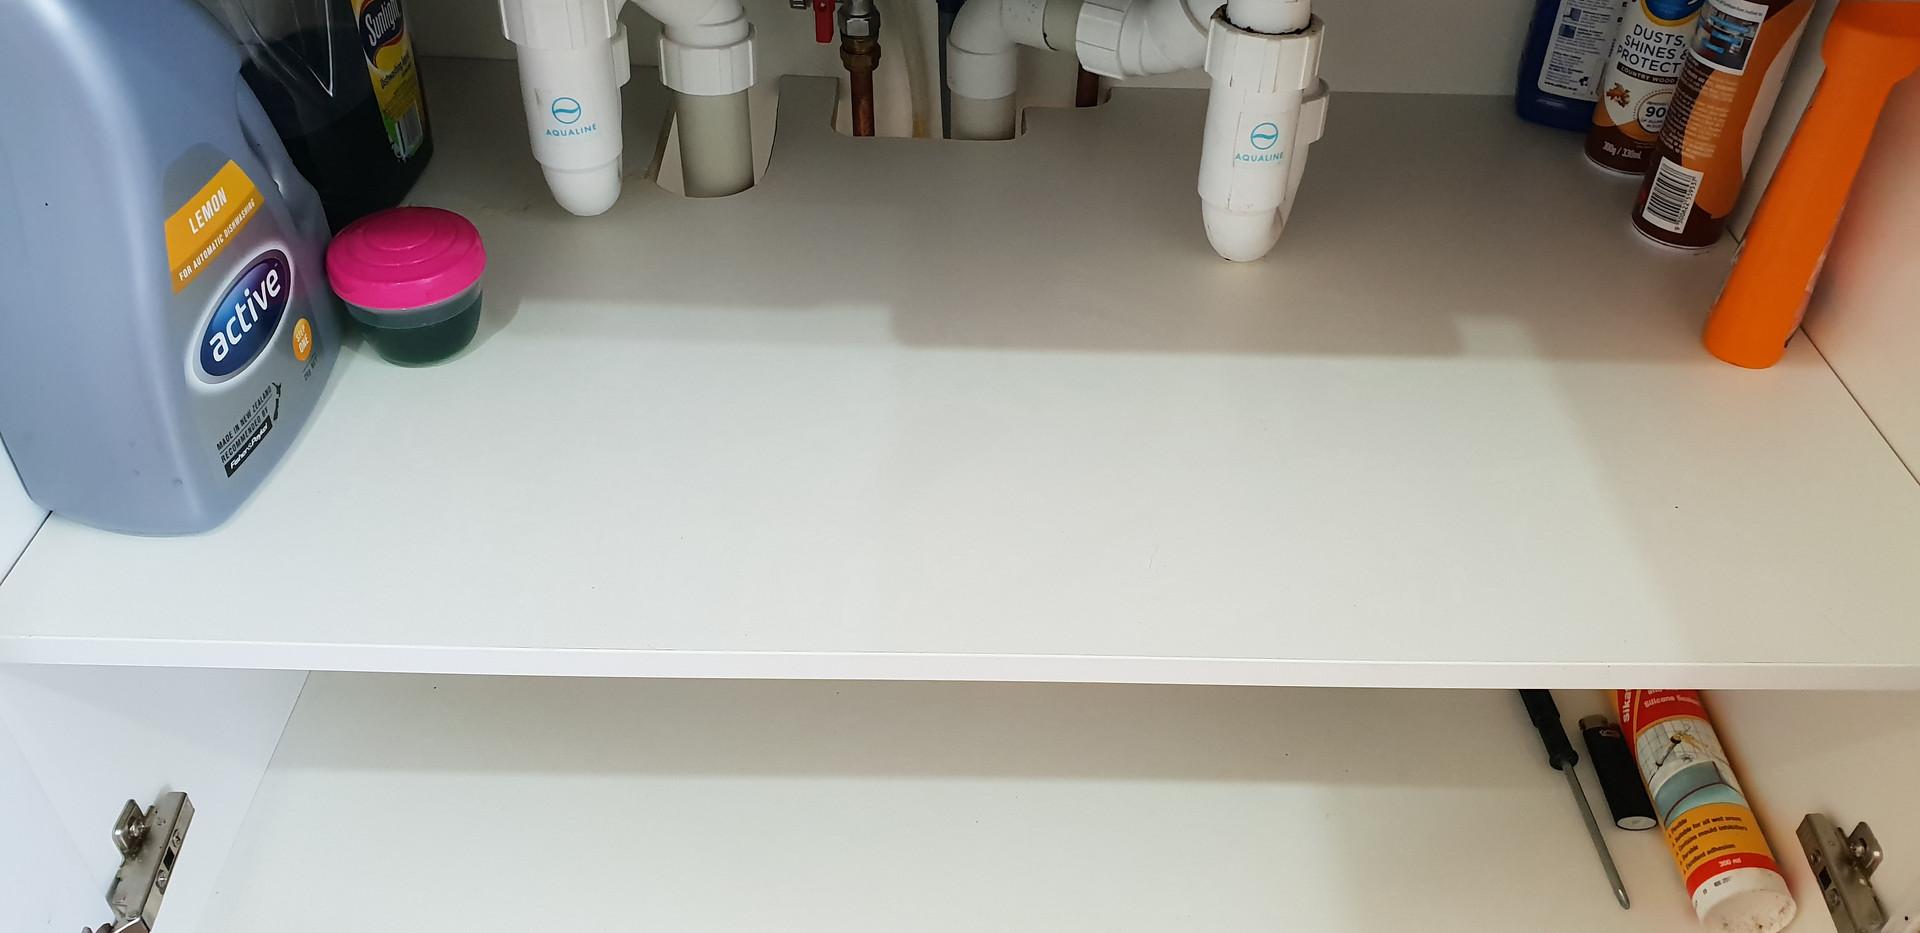 Kitchen cupboard after clean